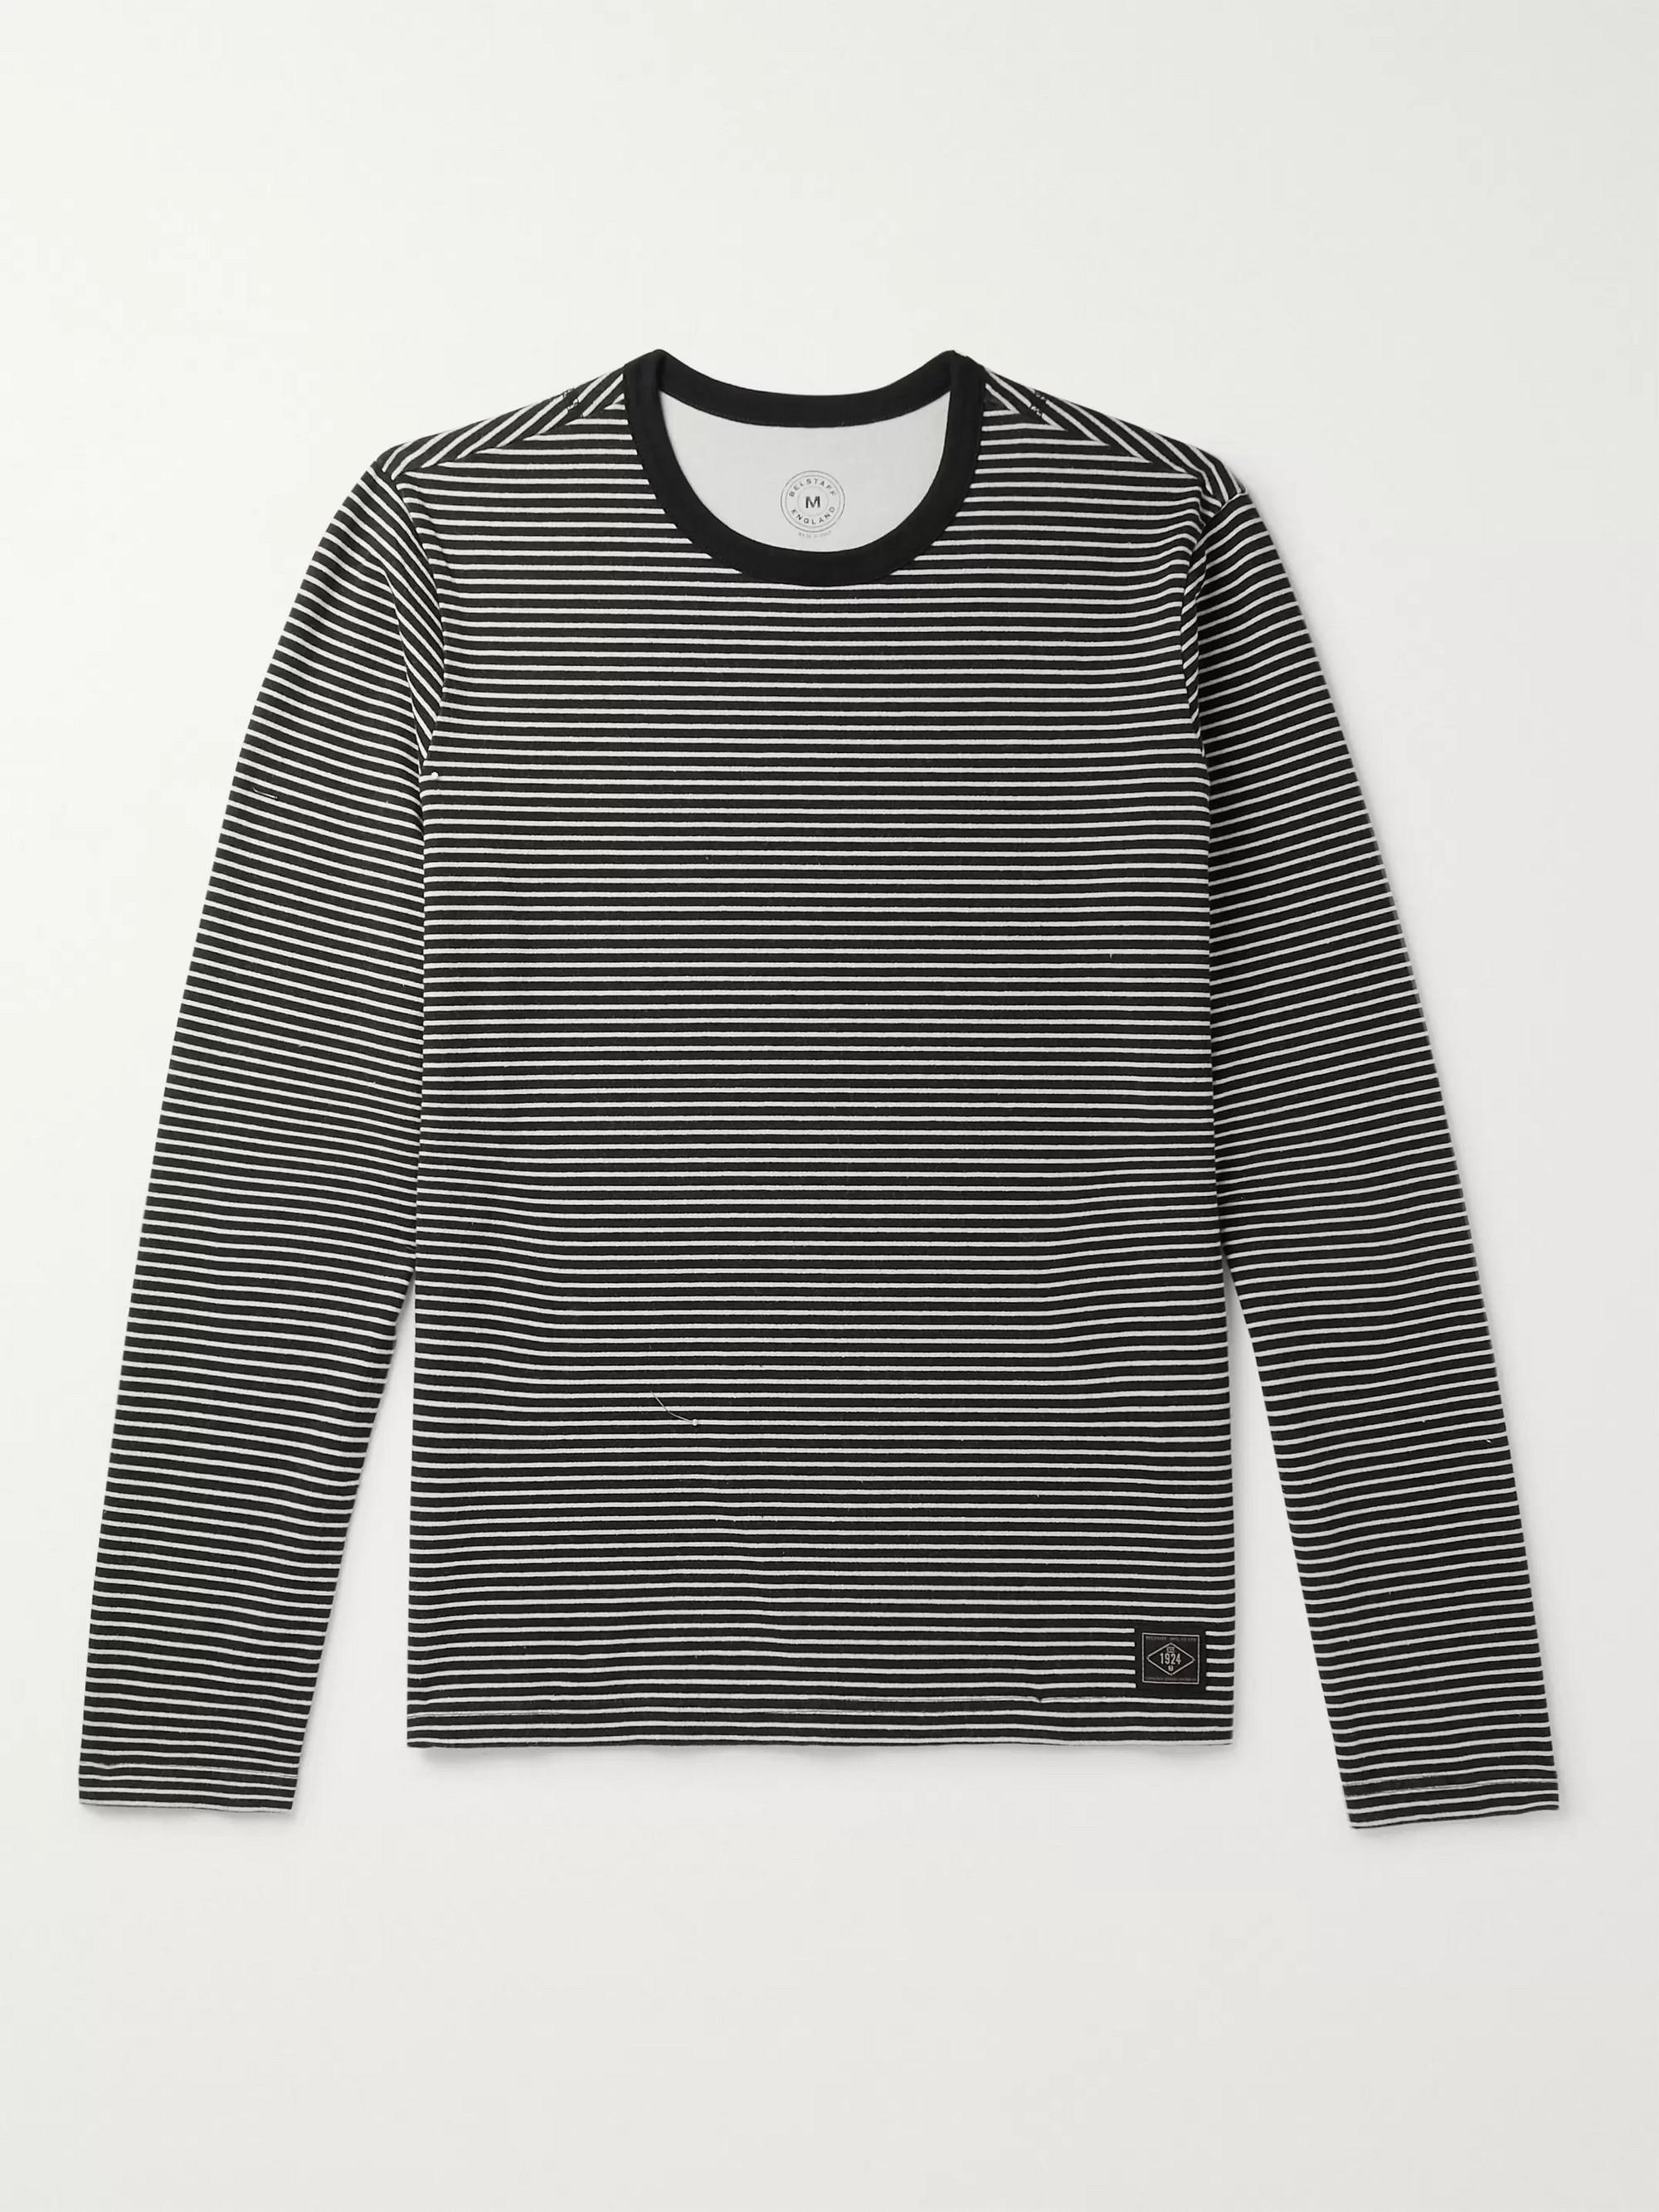 buy popular 6e2d7 3519c Gurnard Striped Brushed-Cotton Jersey T-Shirt